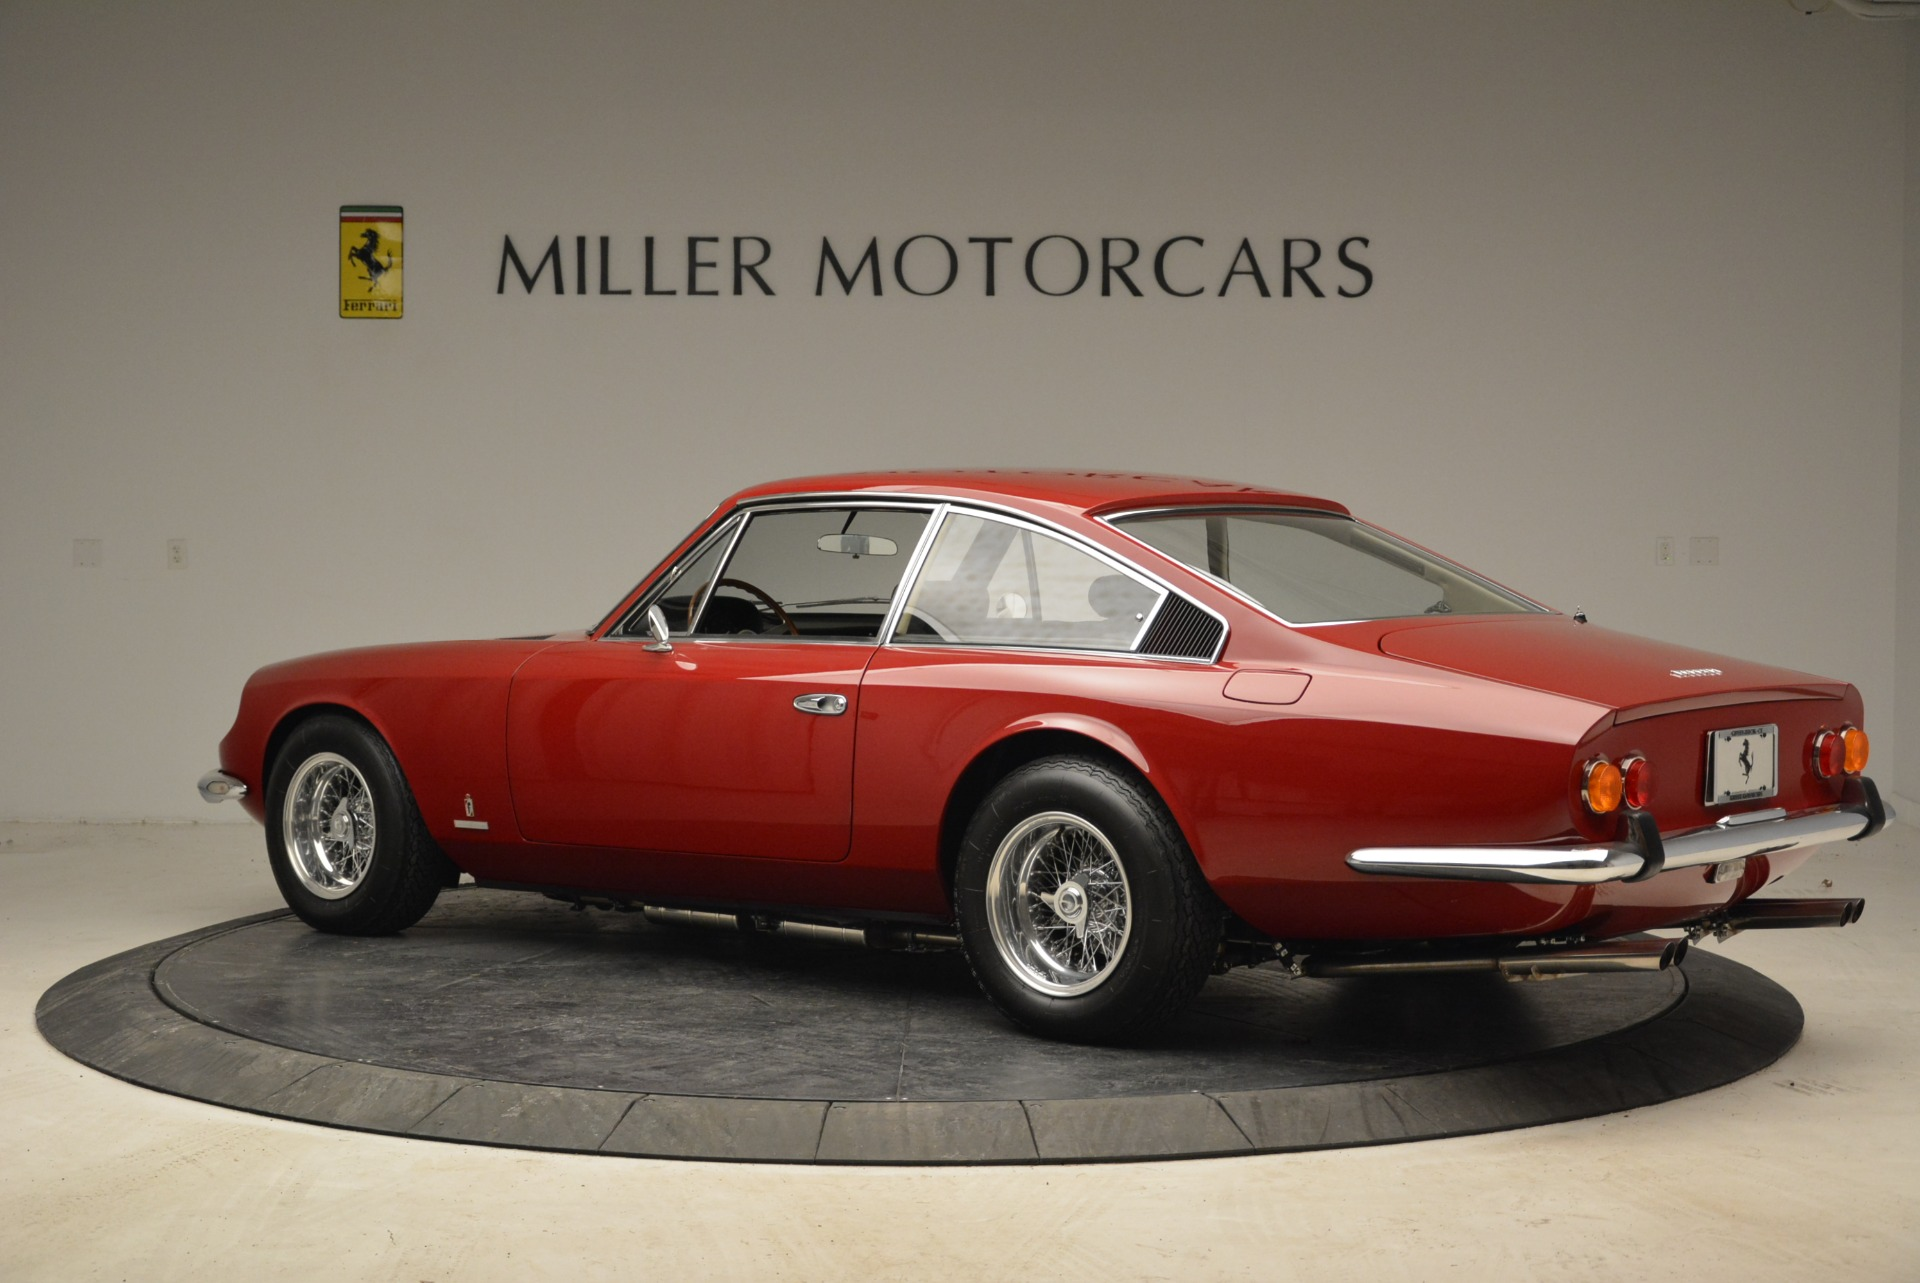 Used 1969 Ferrari 365 GT 2+2  For Sale In Greenwich, CT 1995_p4